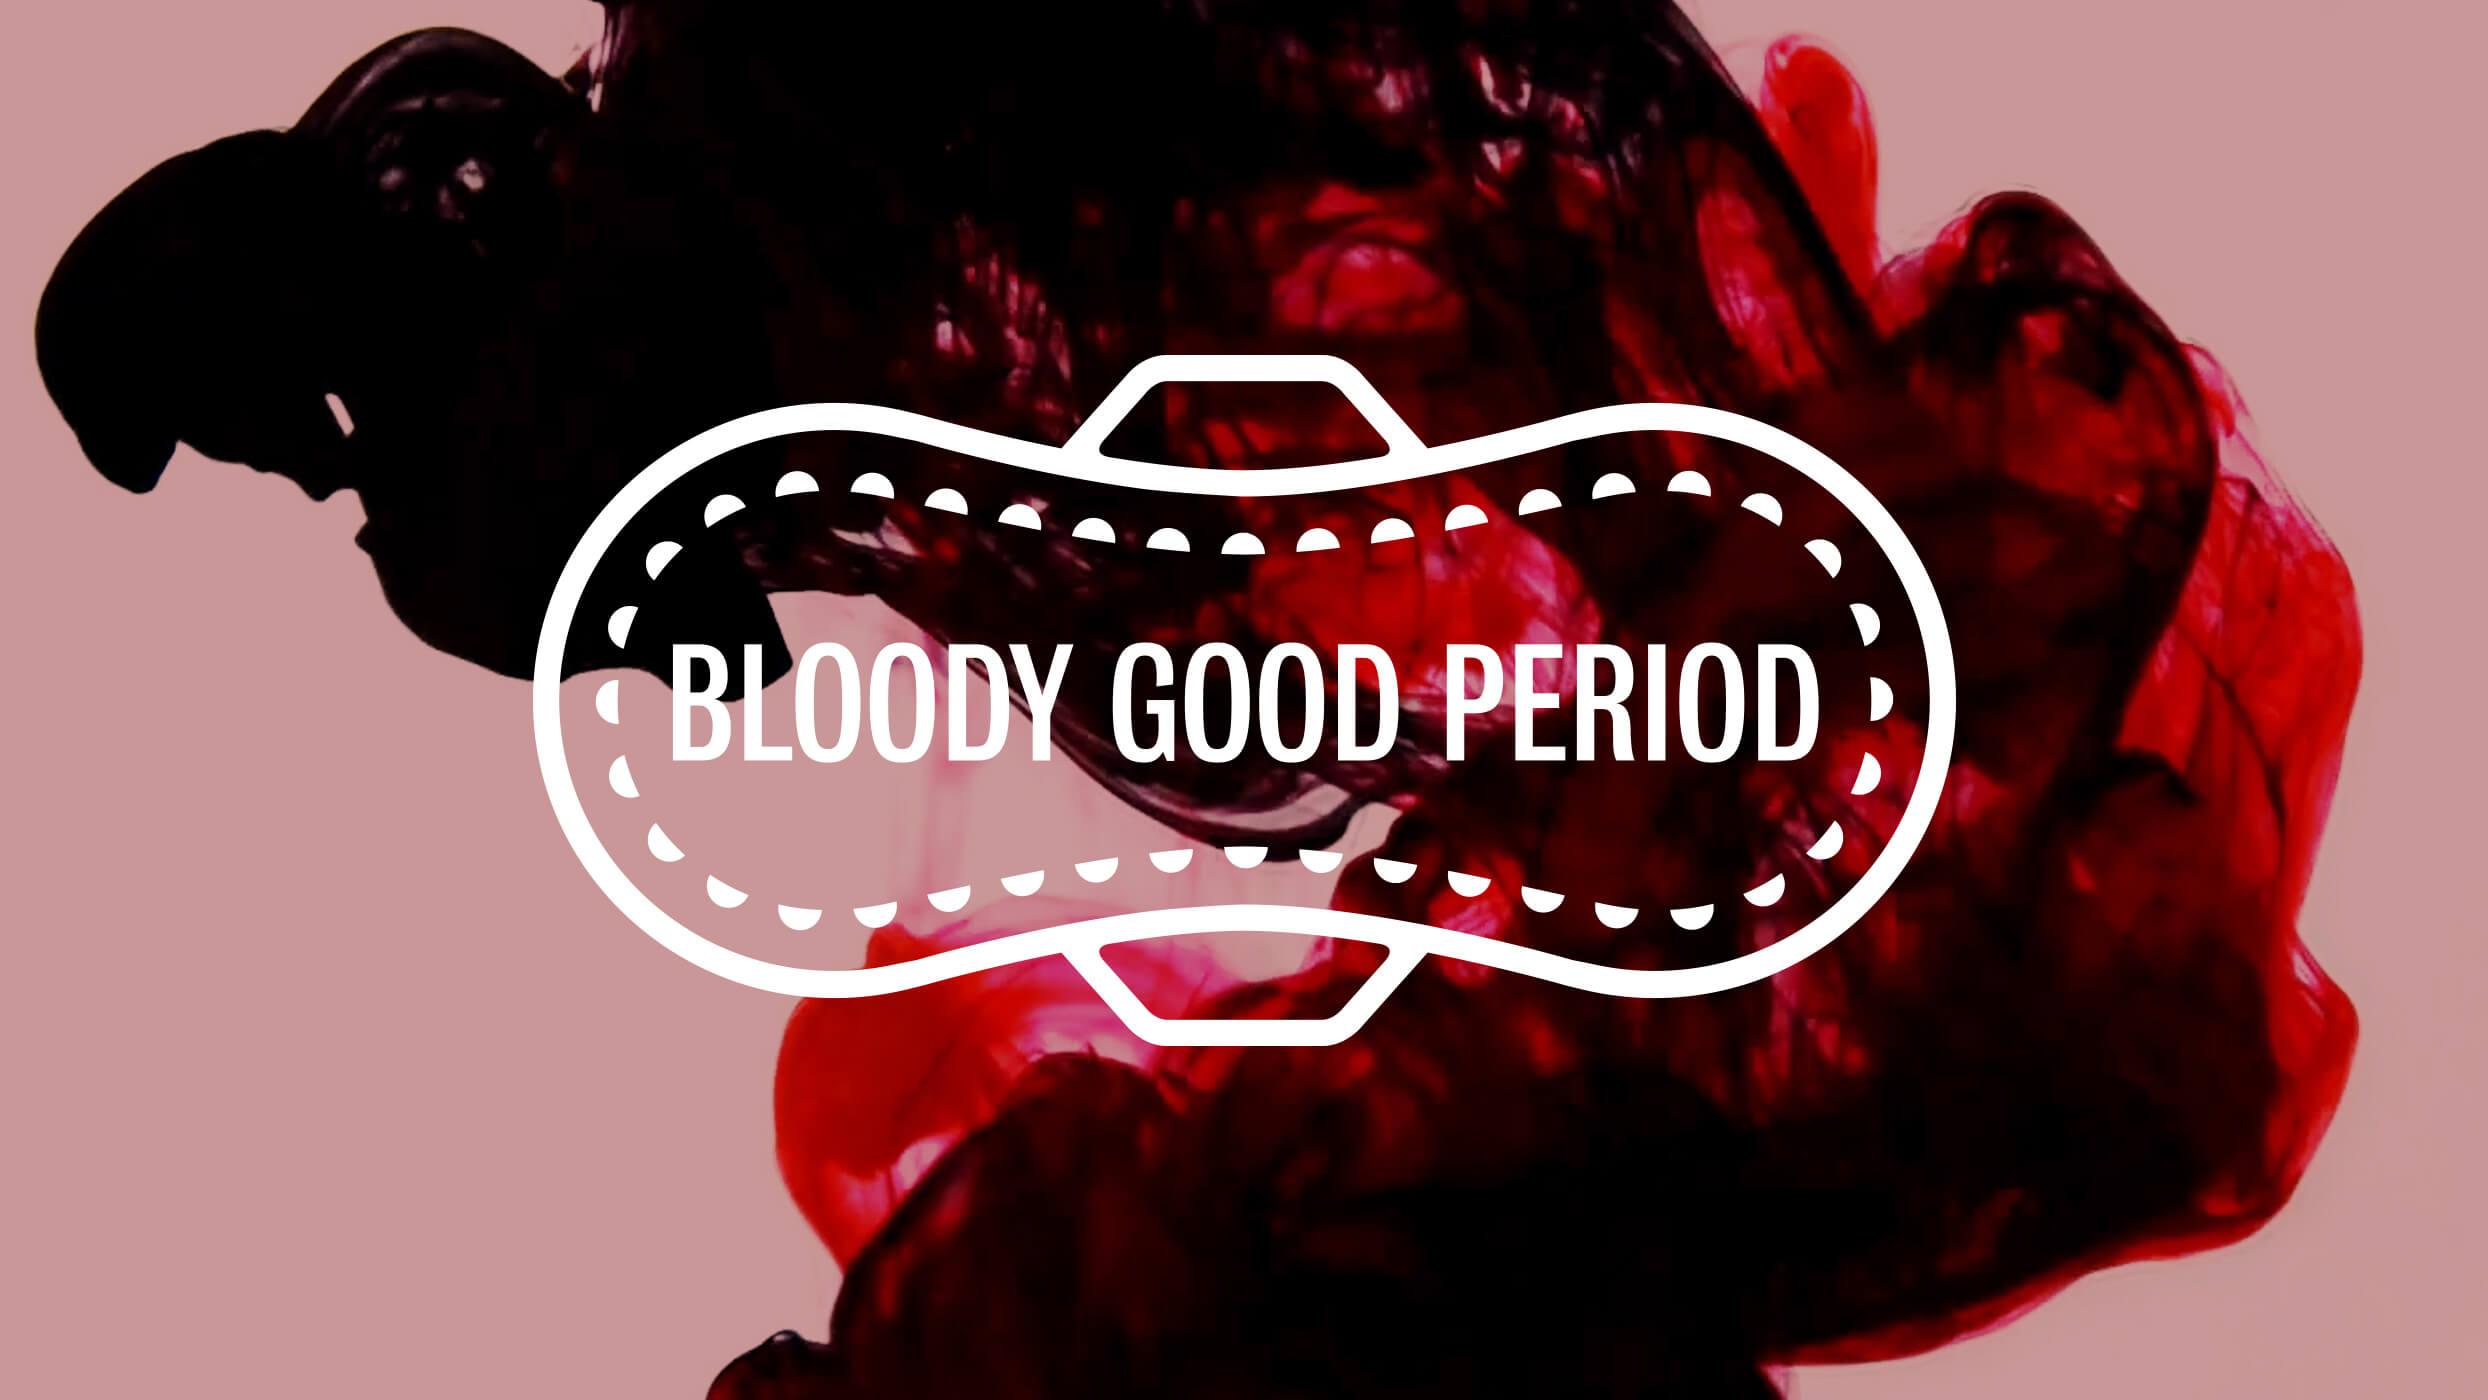 Bloody Good Period logo on blood drop in water